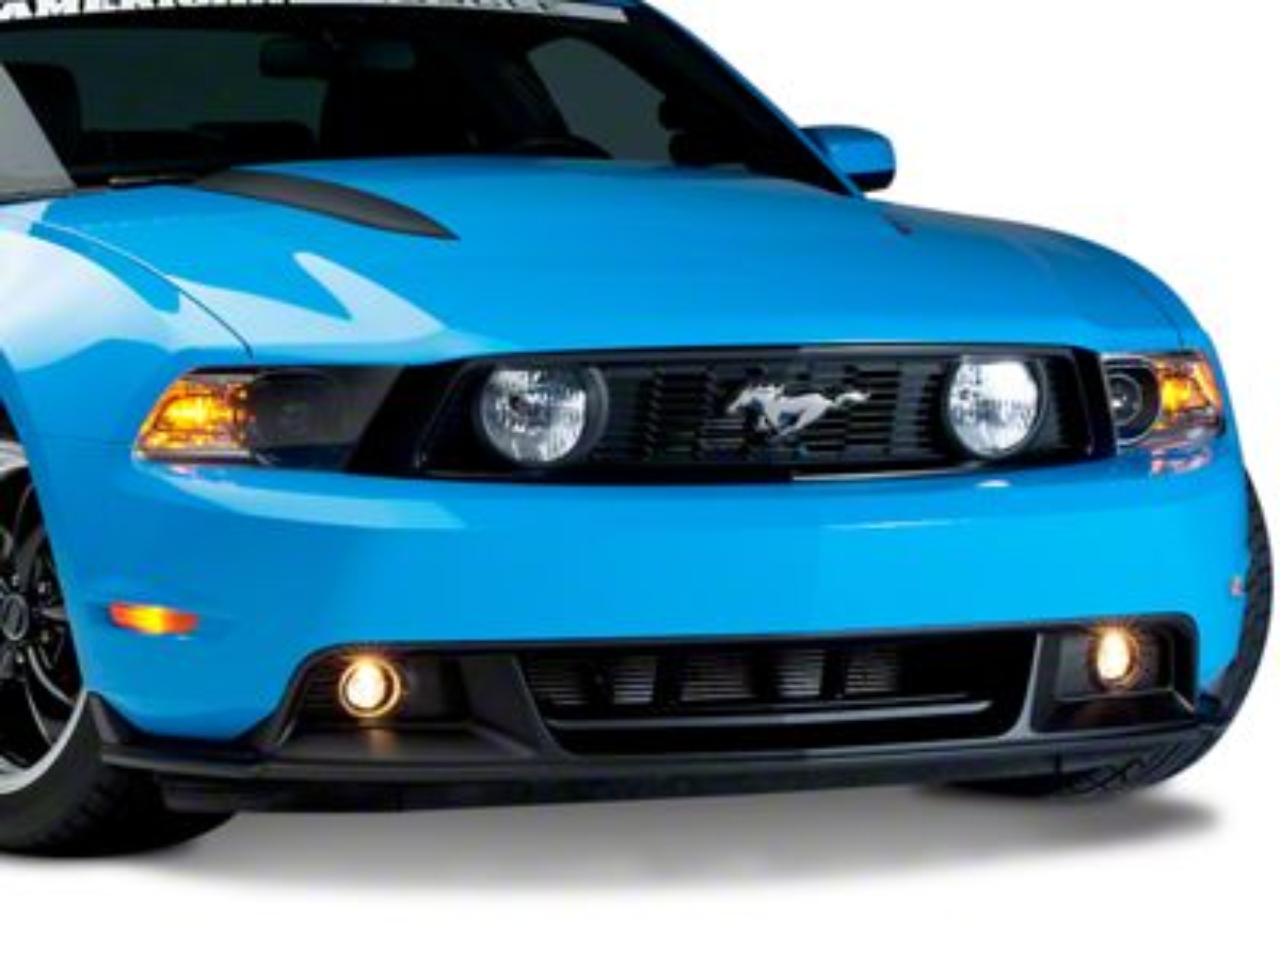 Add Ford BOSS/CS Style Lower Front Fascia w/ Foglights (10-12 GT)